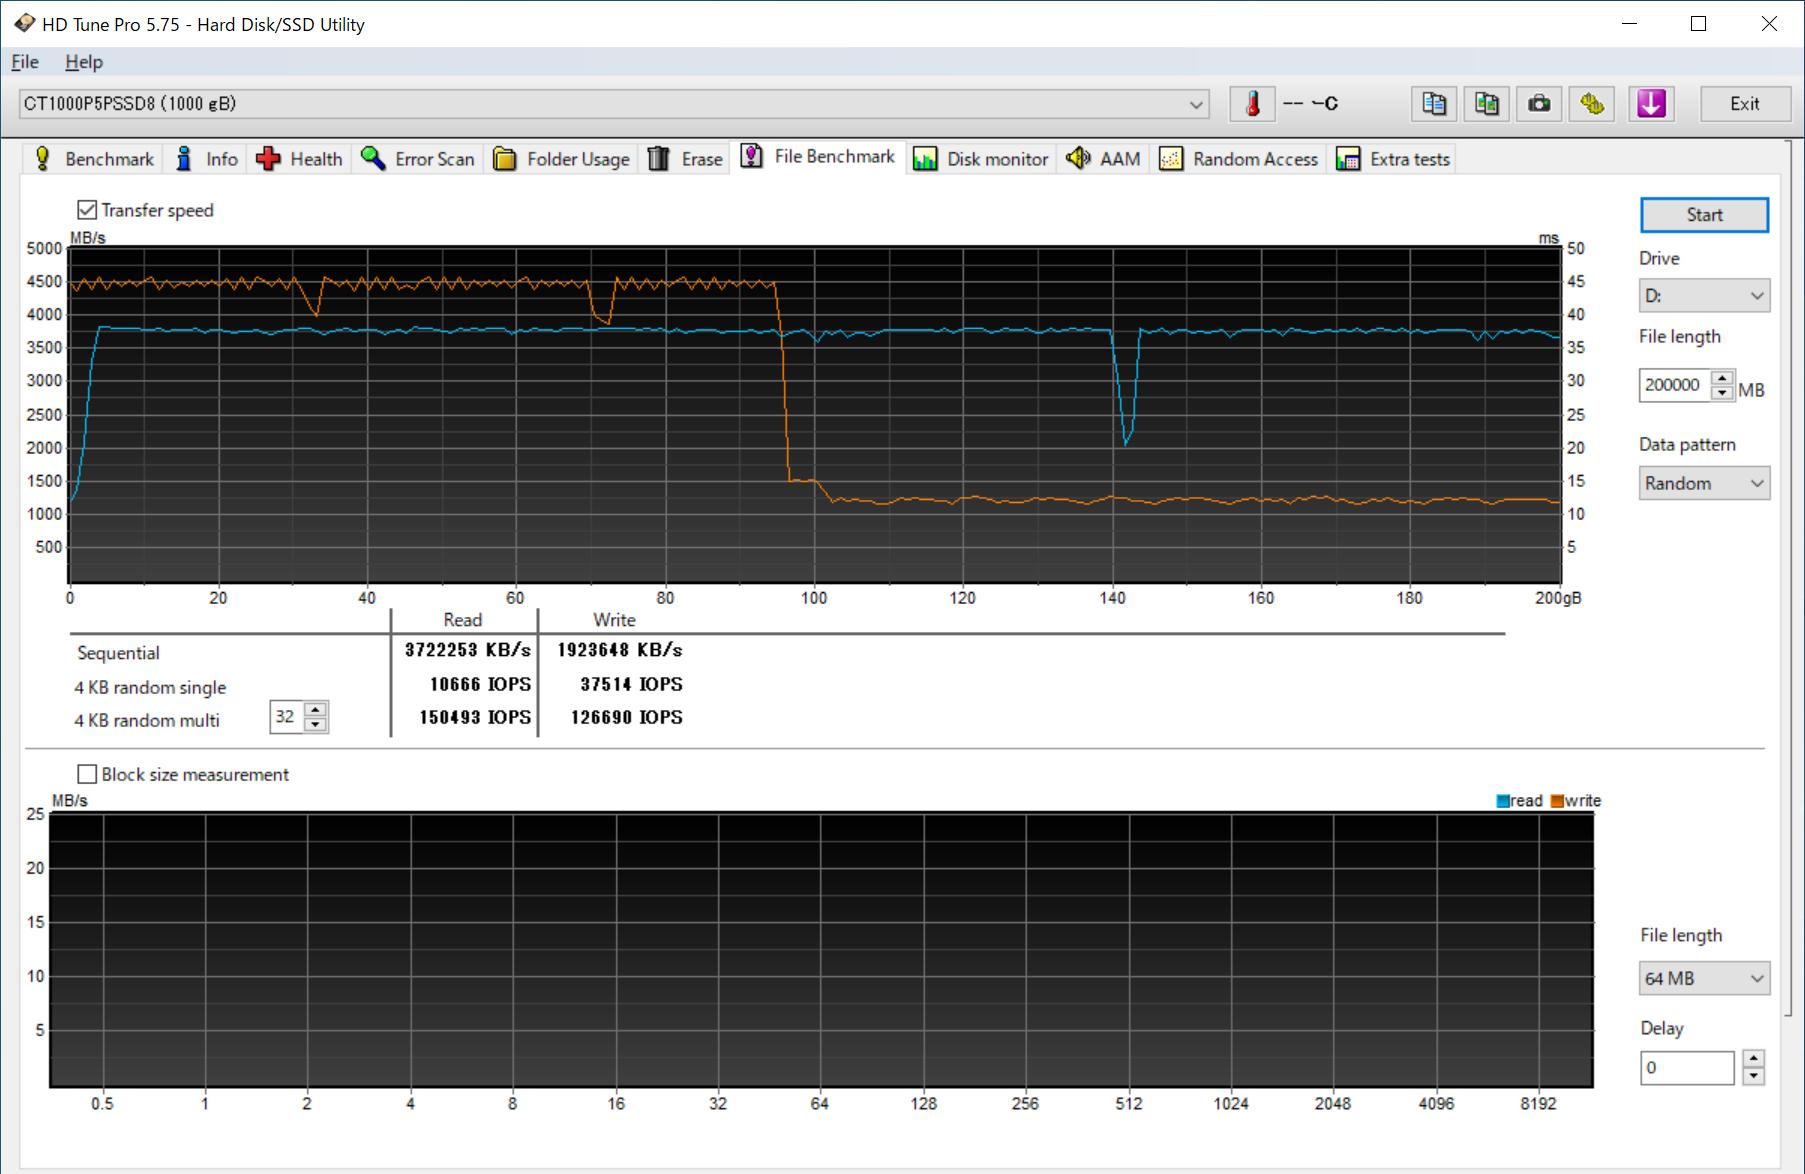 HD Tune Pro 5.75 File Benchmark(データ200GB設定)の結果